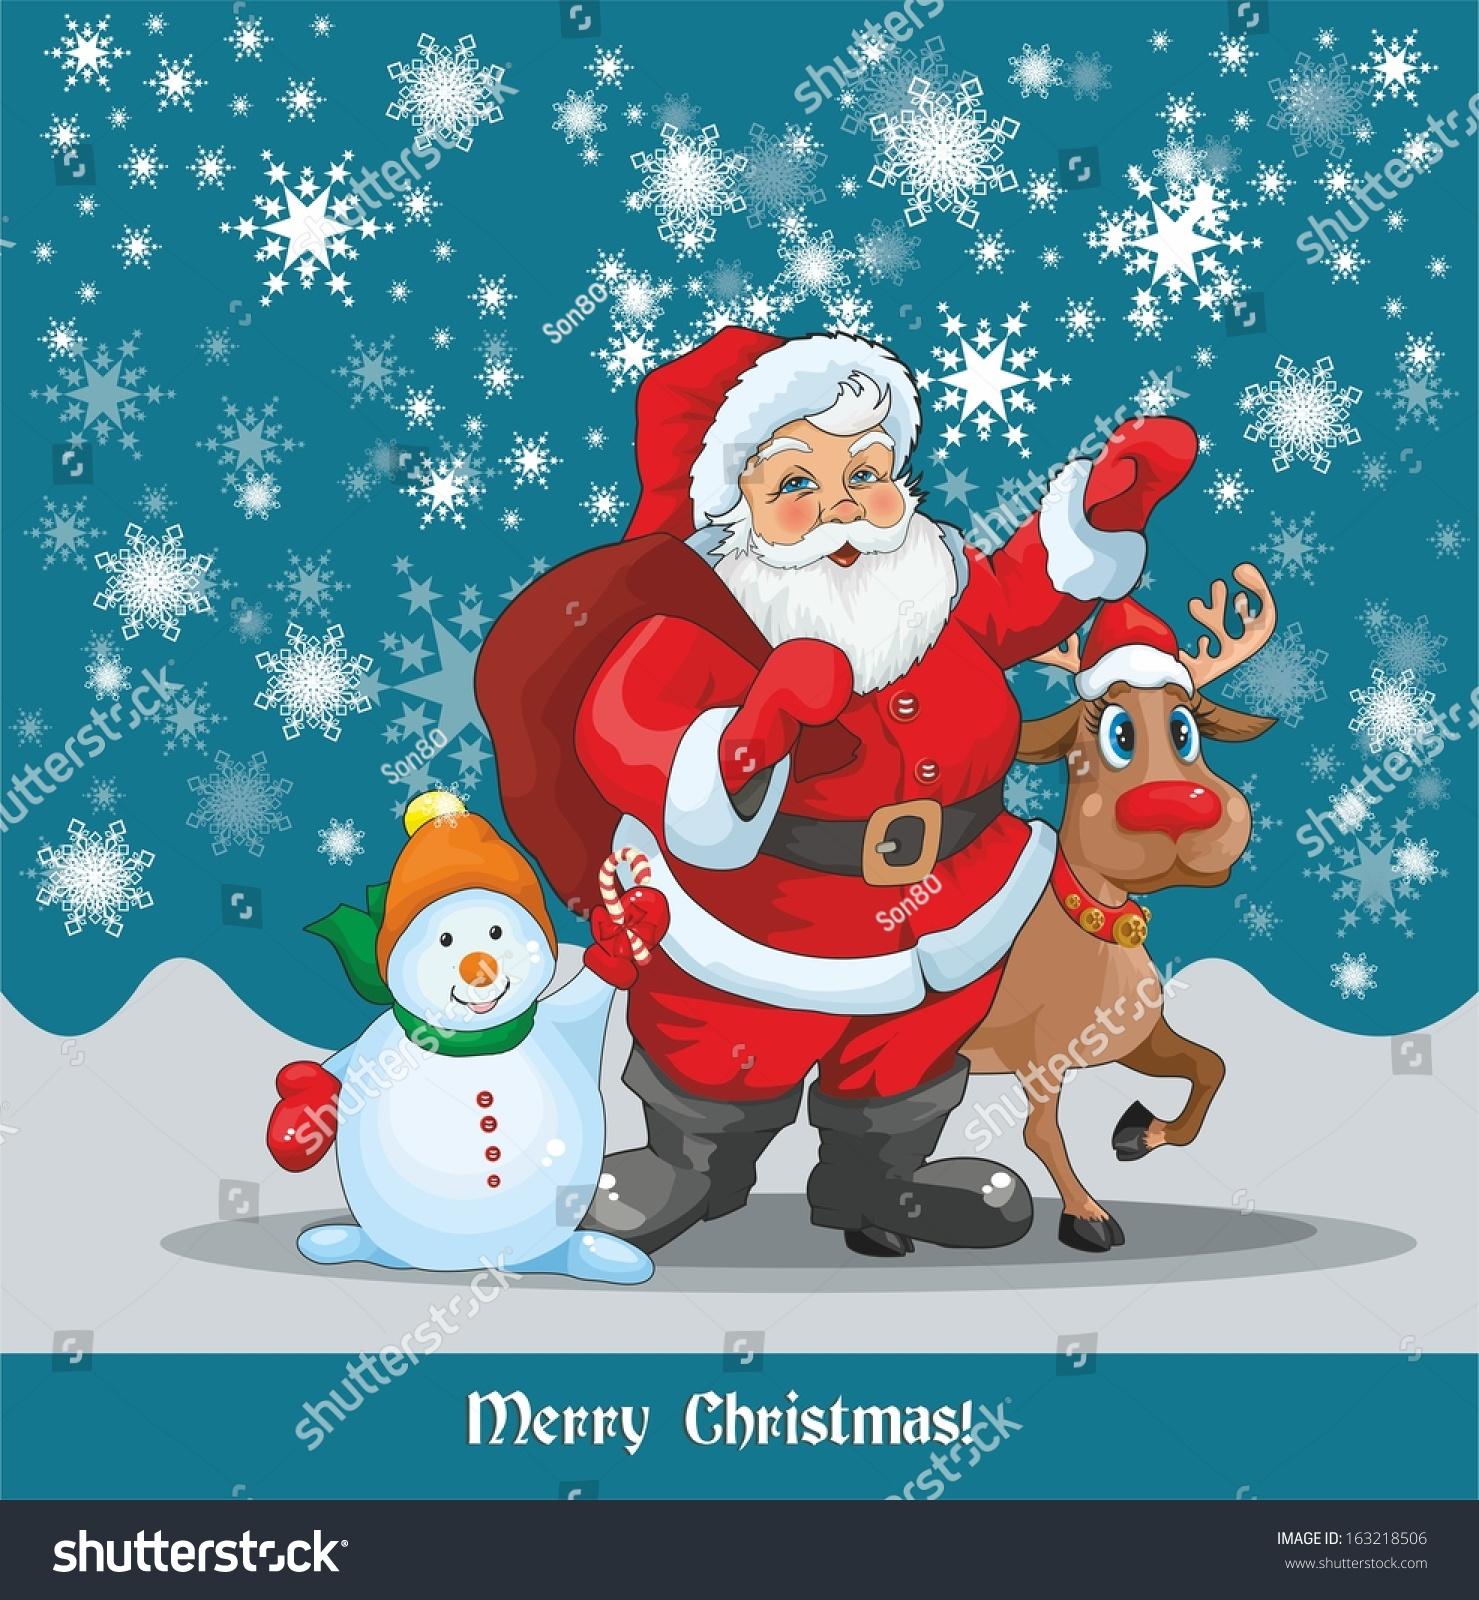 blue christmas card with santa reindeer and snowman - Santa And Snowman